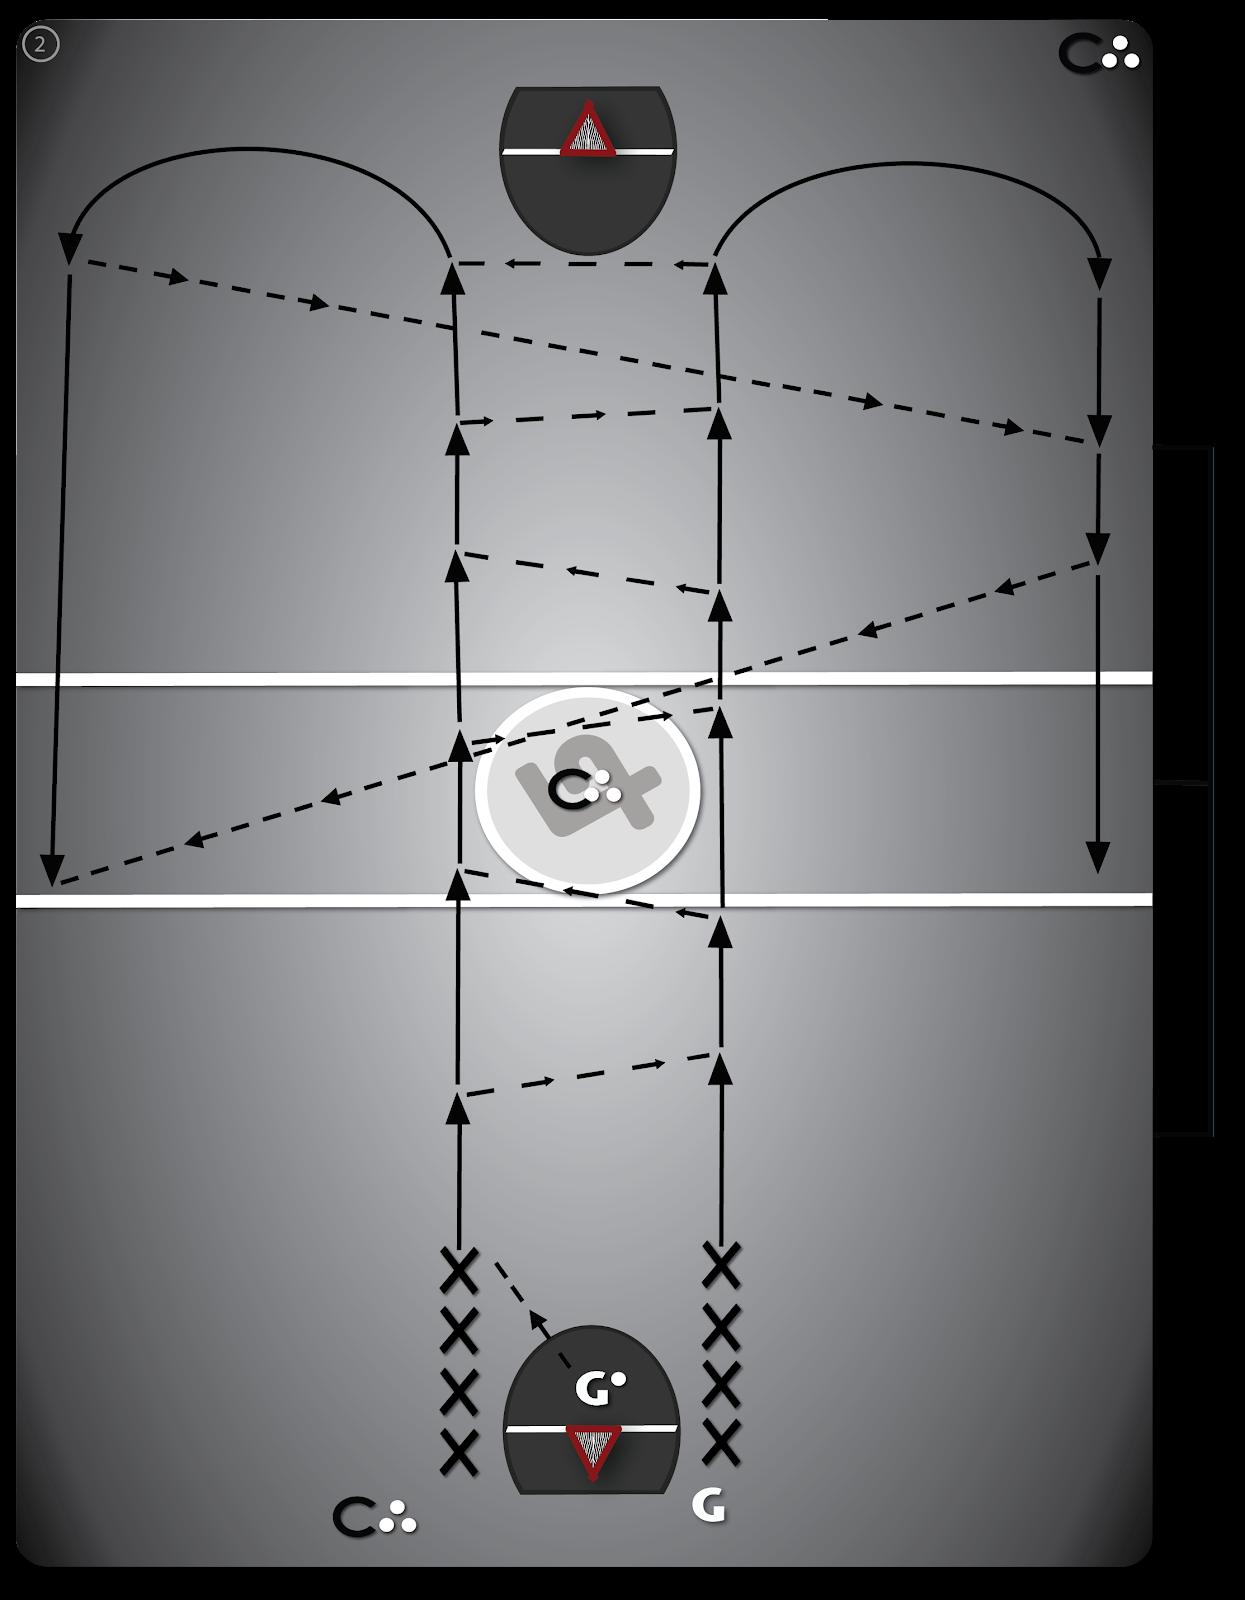 Lacrosse diagram drill #3 - Partner Passing On-The-Run